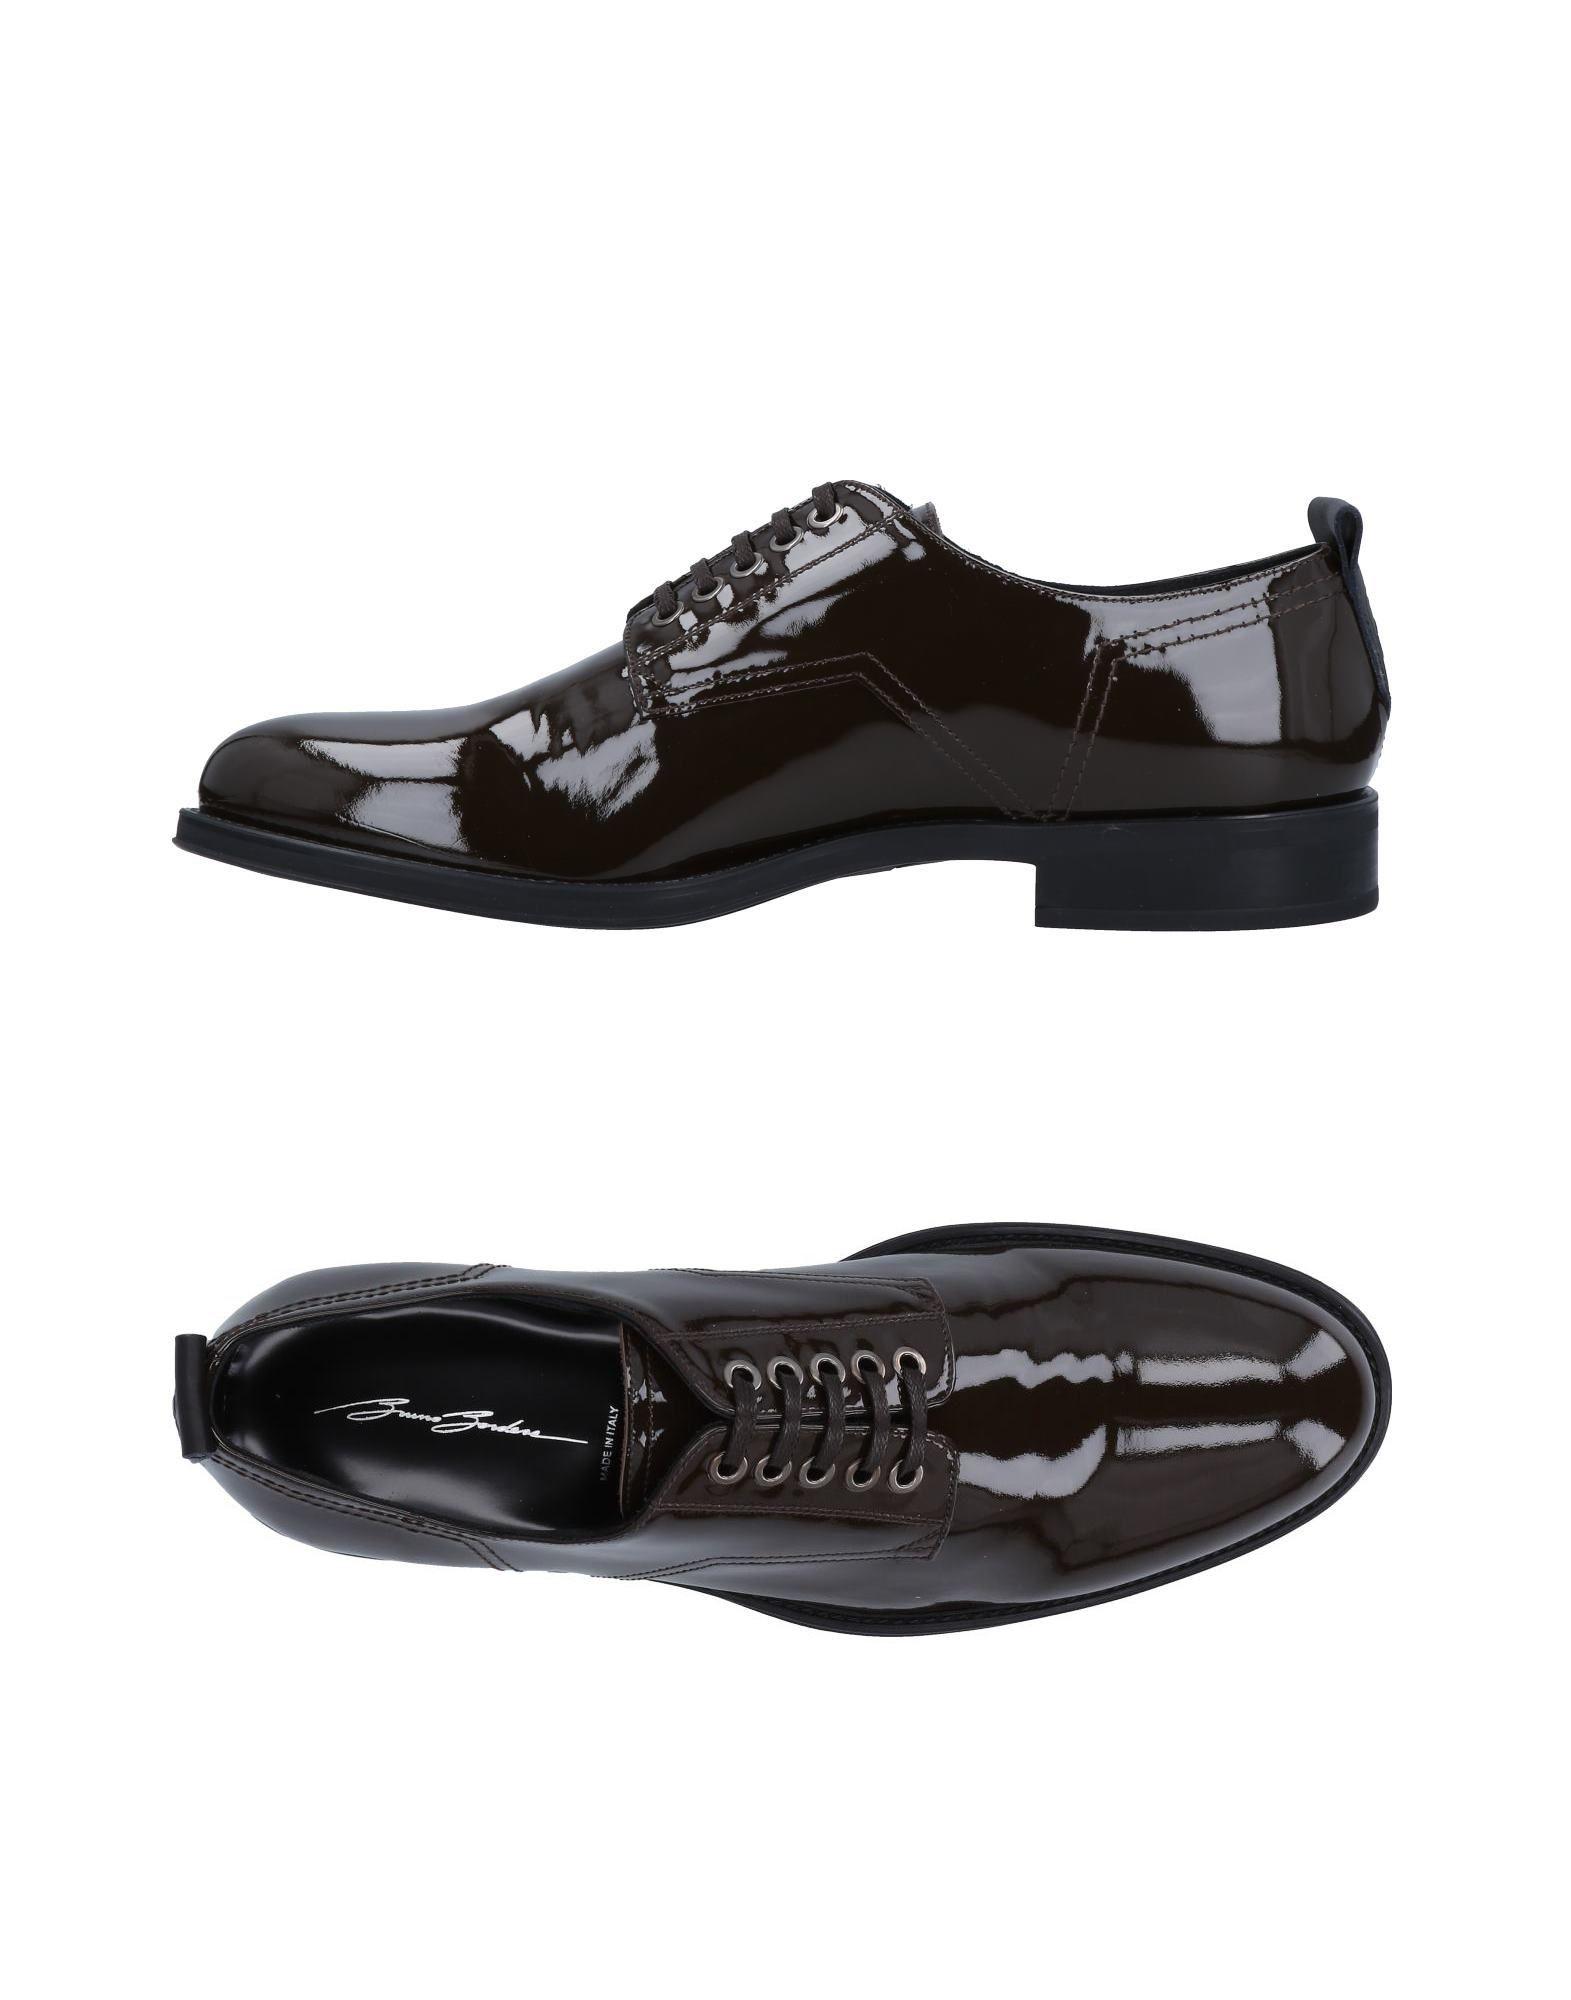 Chaussures À Lacets Bruno Bordese Homme - Chaussures À Lacets Bruno Bordese   - 11522823HN